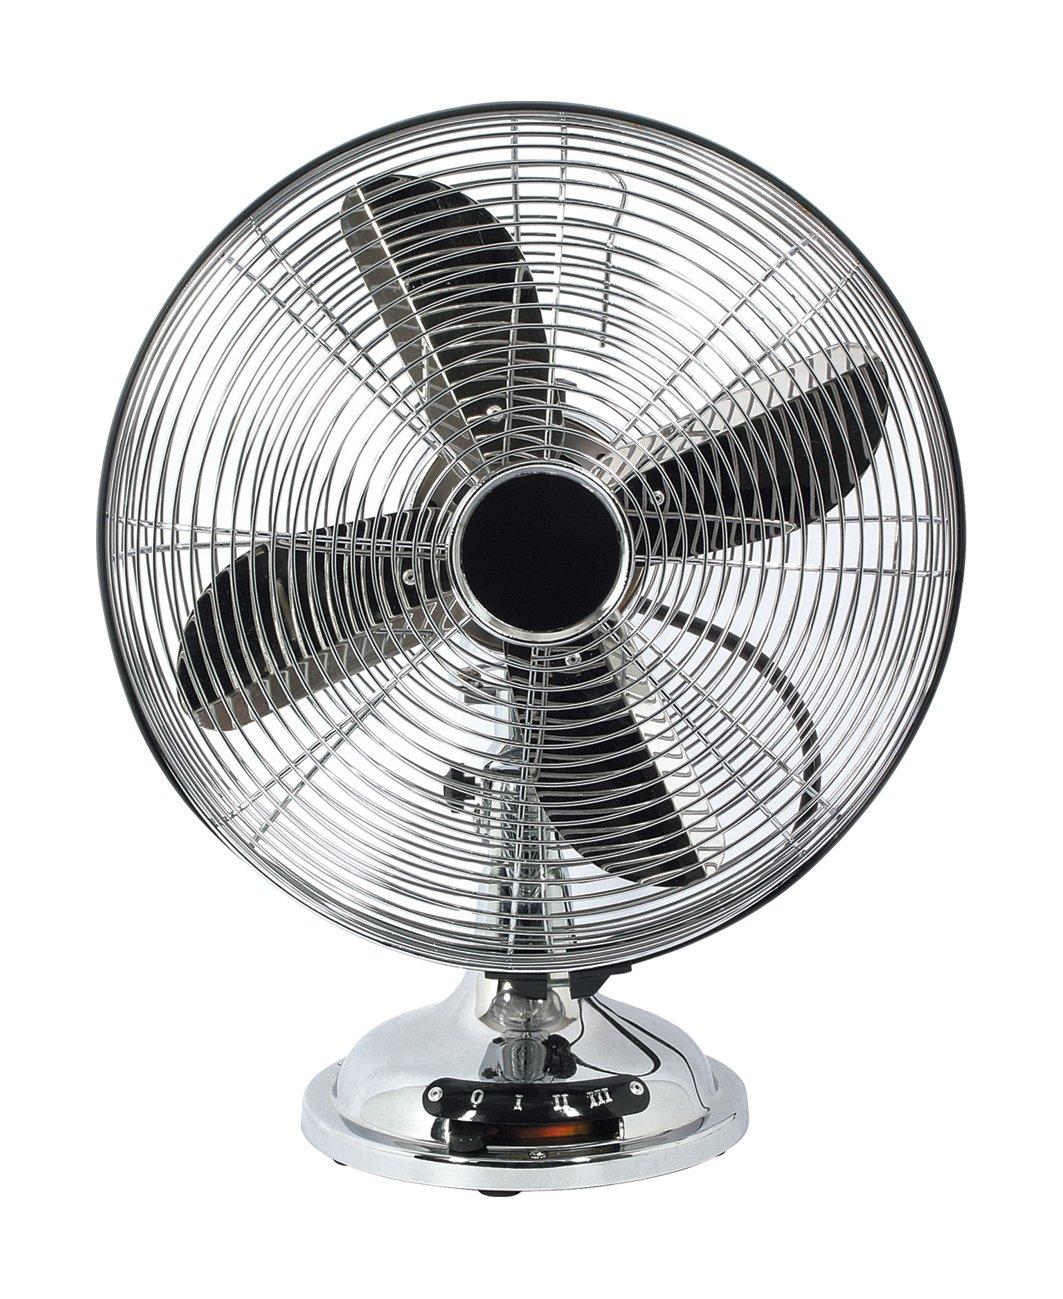 ventilatori l 39 aria fresca del design cose di casa